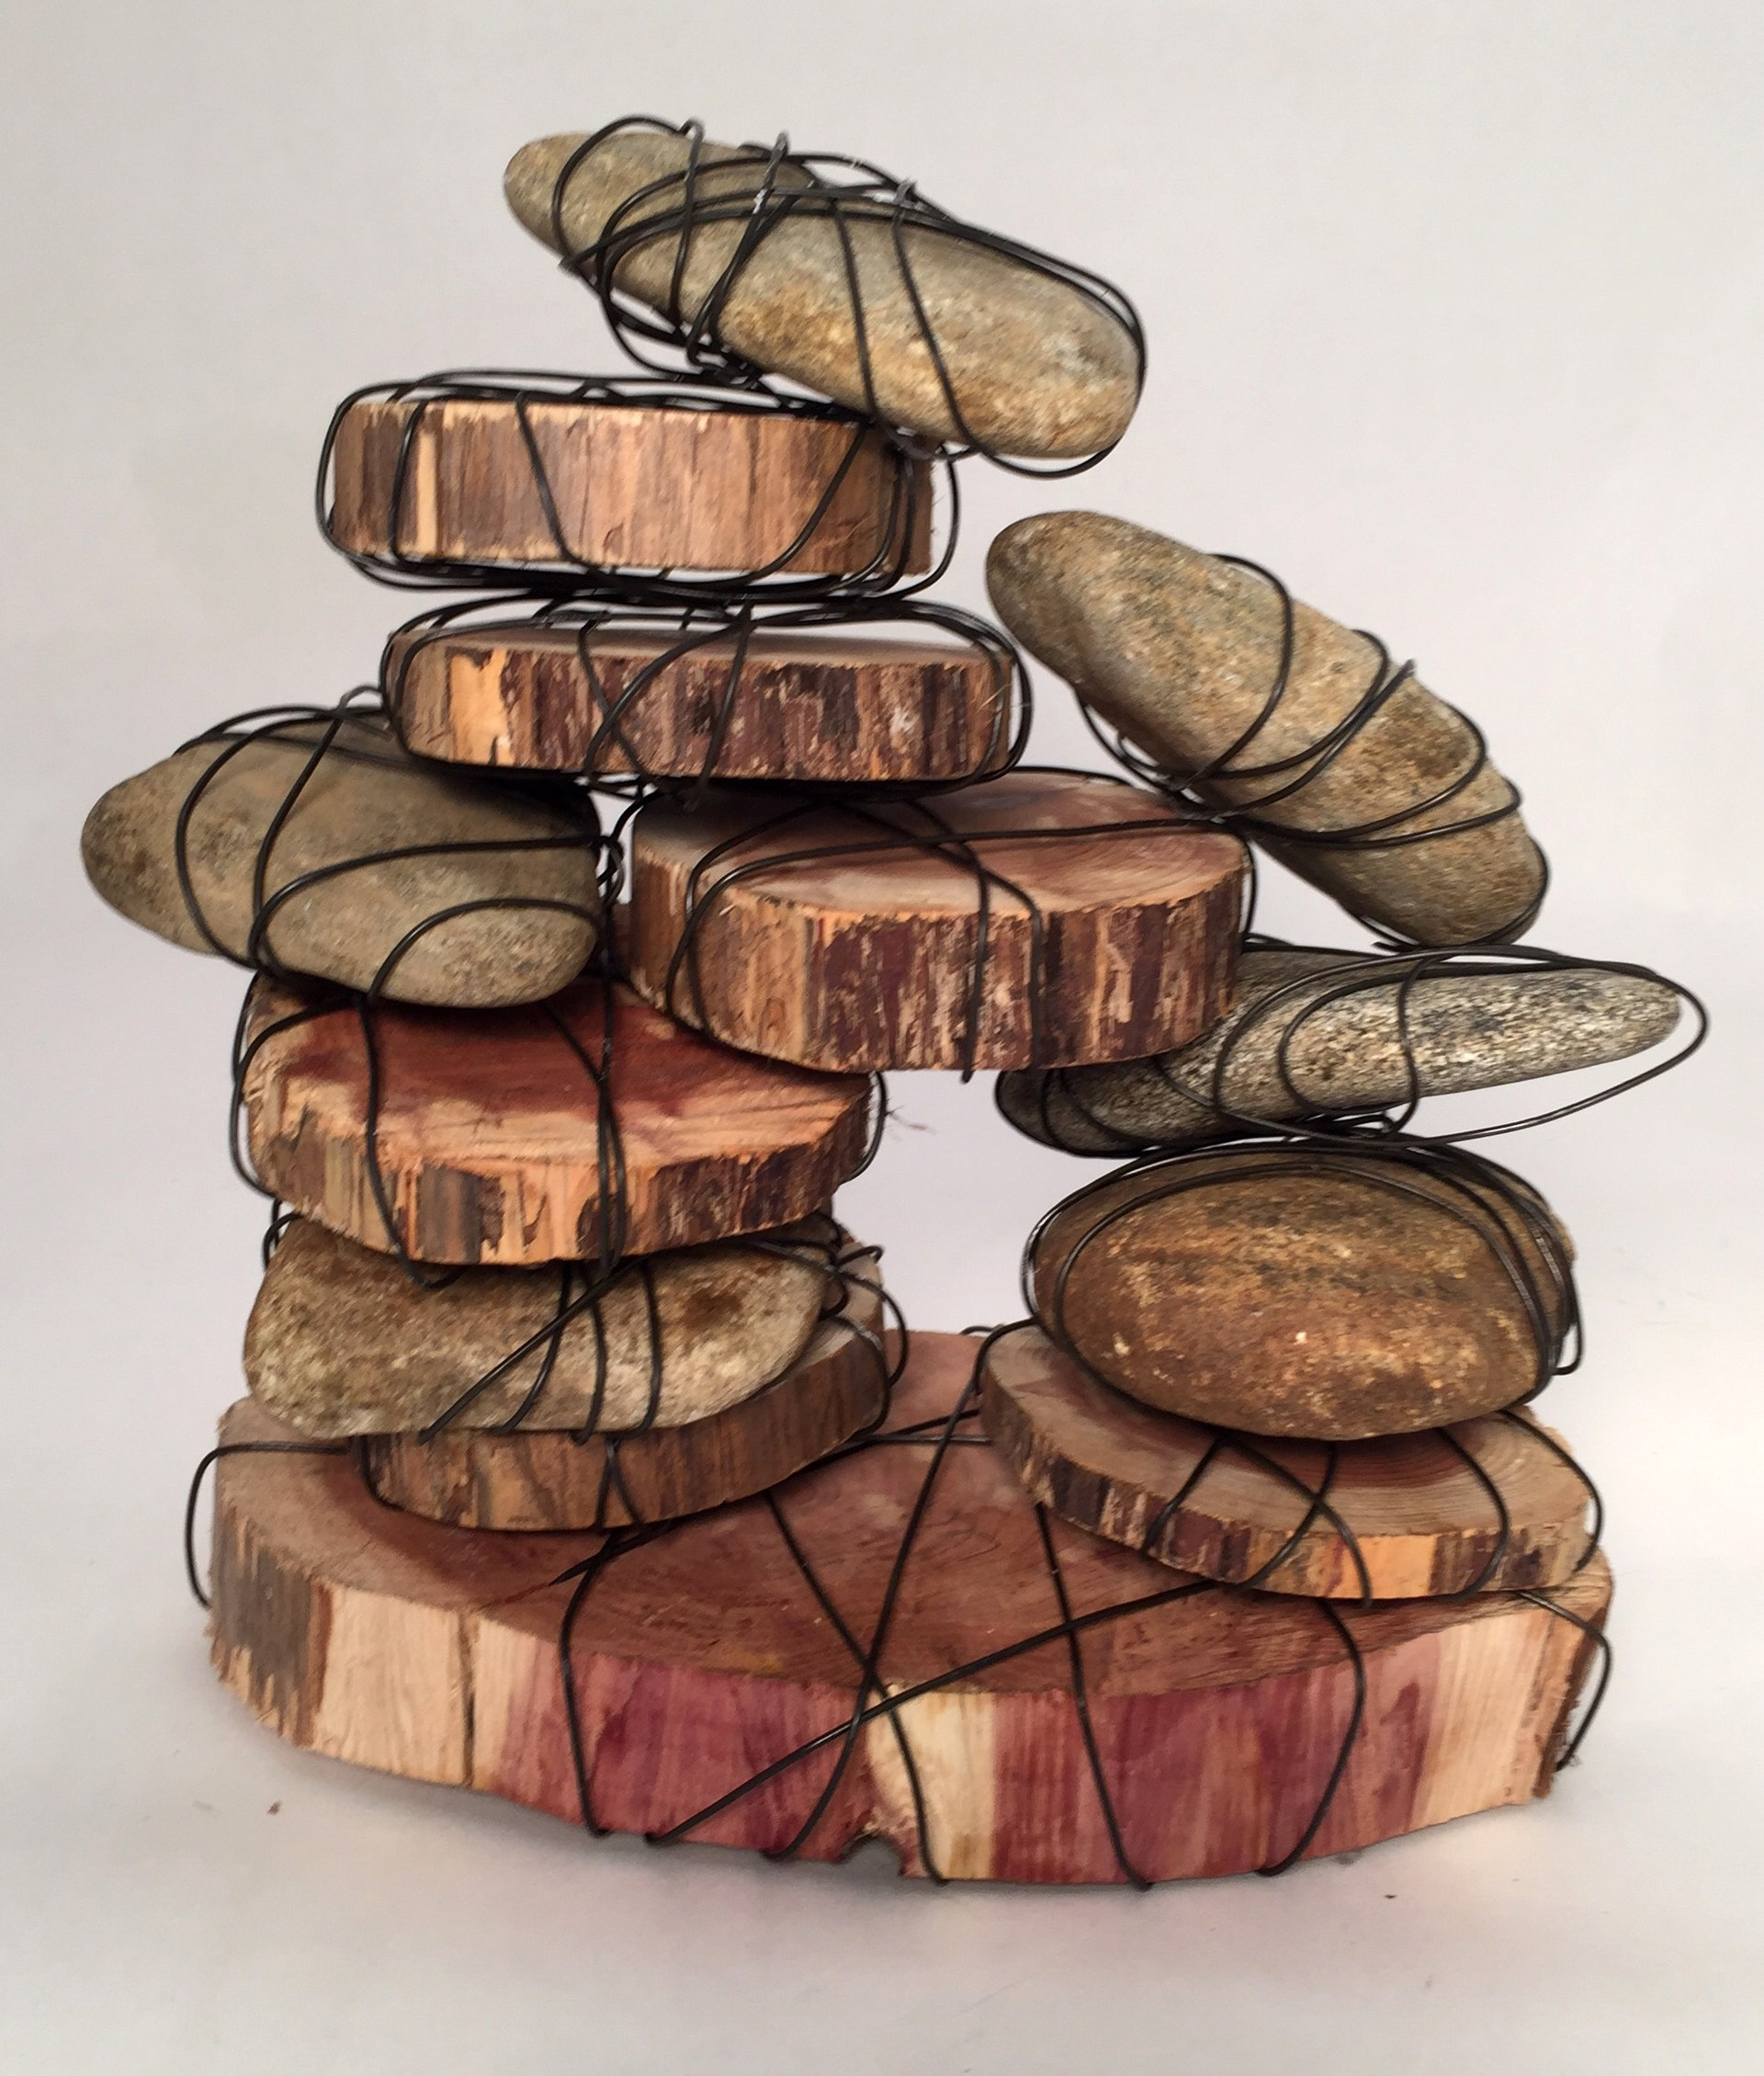 Sculpture of rocks bound with wire